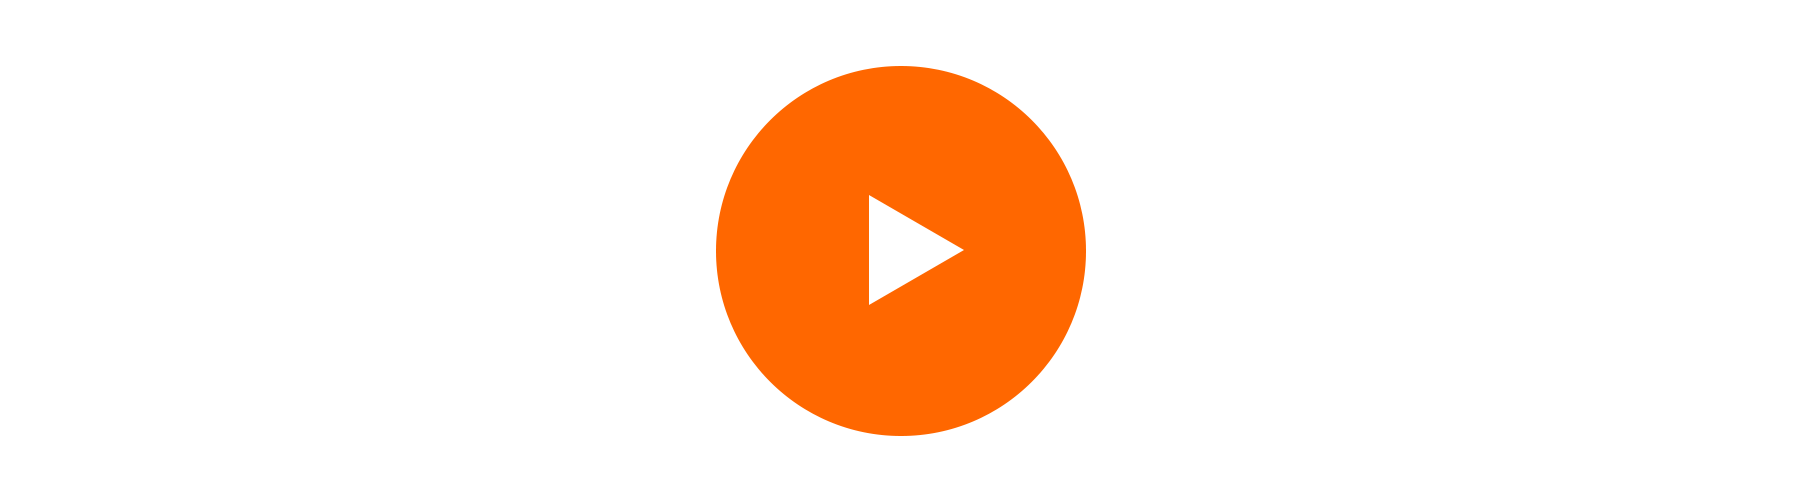 Videor om oljemåleri